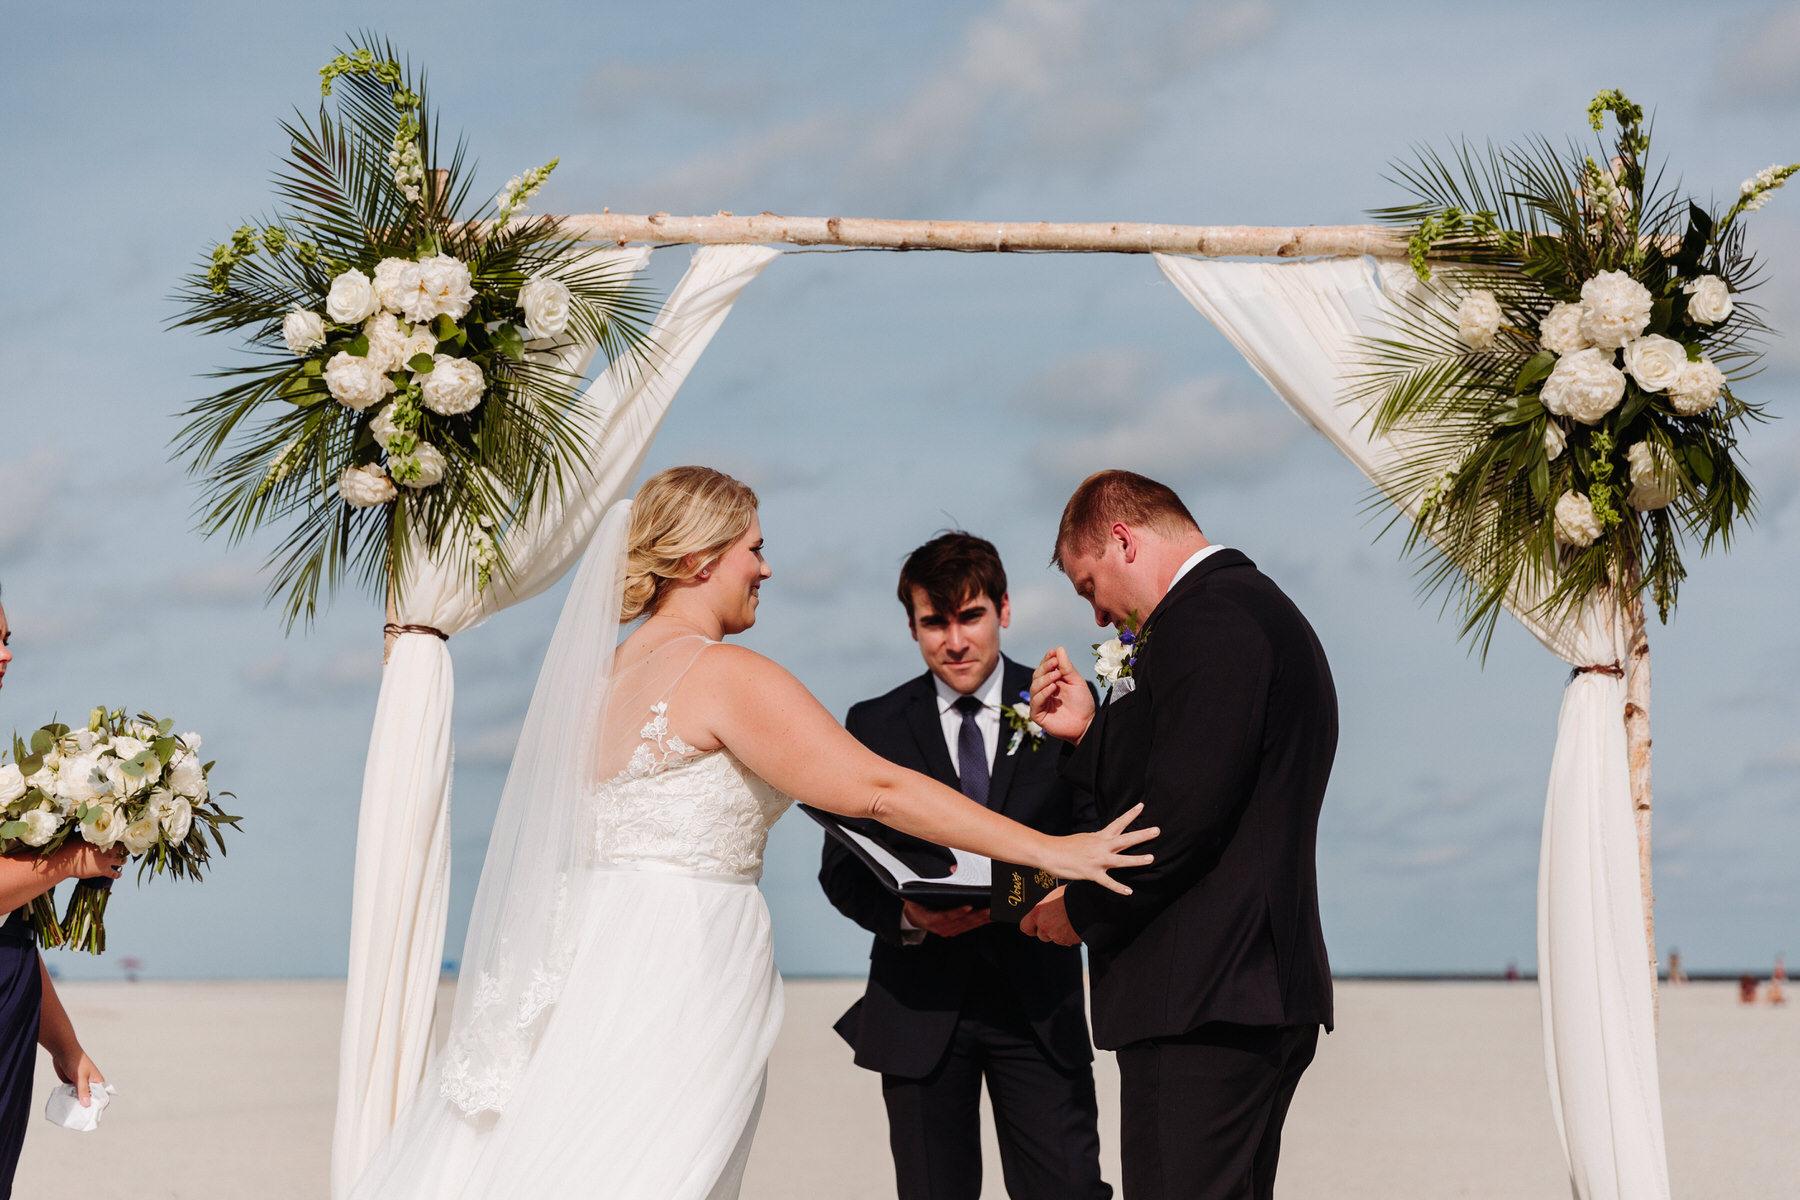 wild-dunes-charleston-isle-of-palms-IOP-wedding-813.JPG